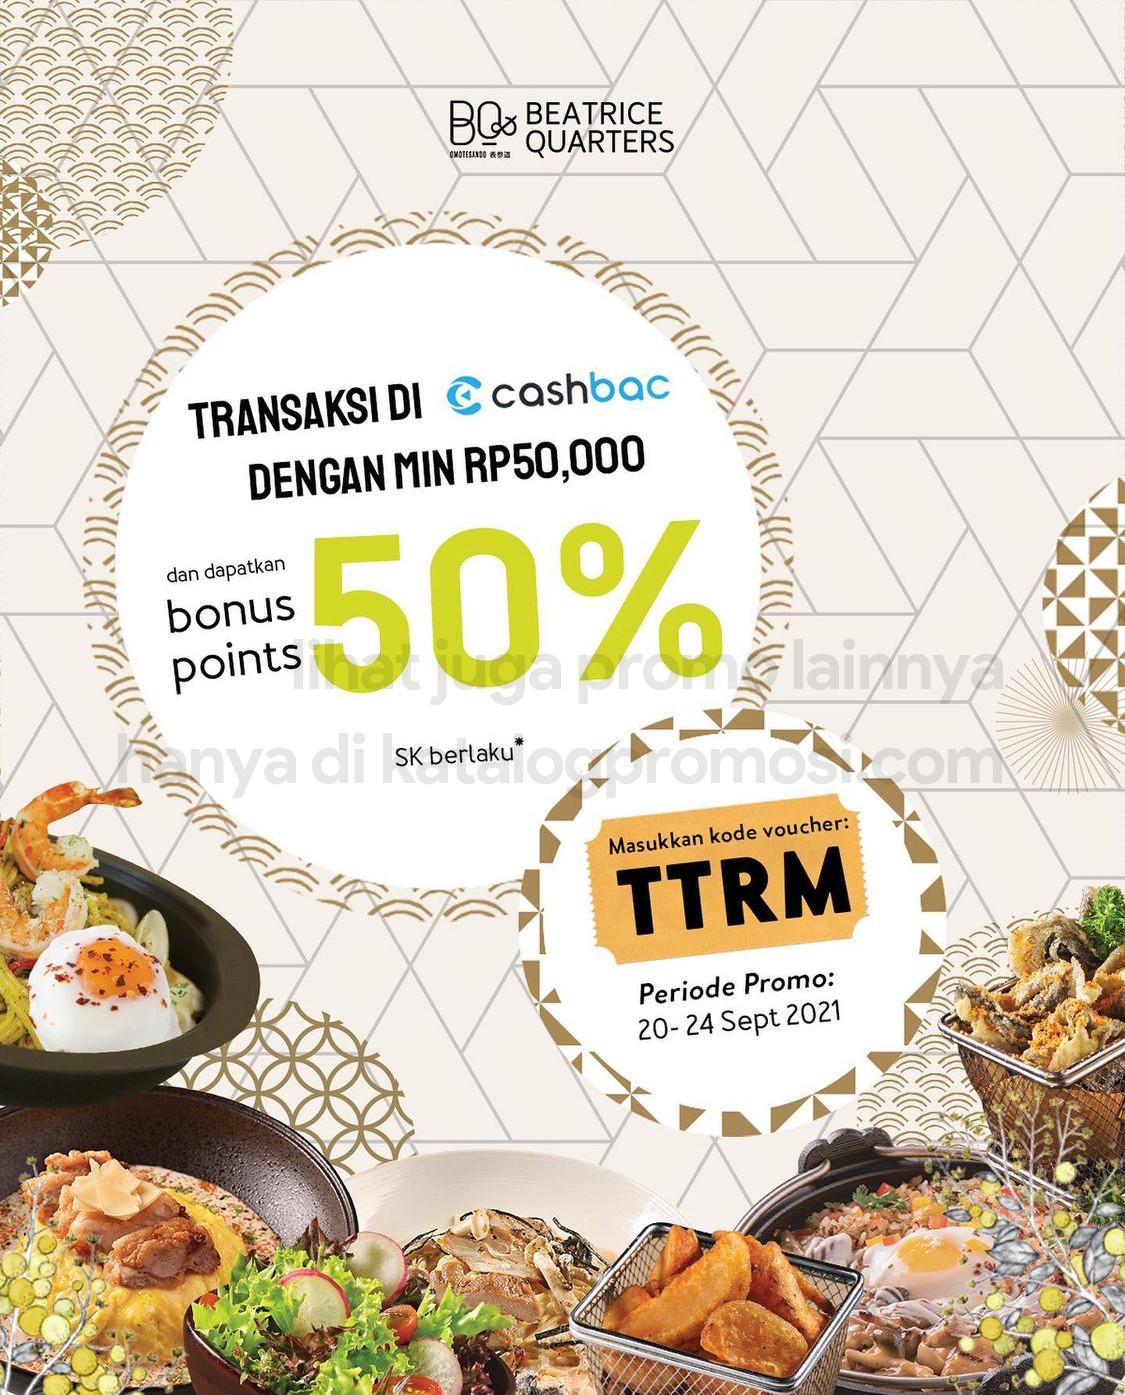 Promo Beartice Quarters BONUS POINT hingga 50% KHUSUS transaksi pakai CASHBAC APP